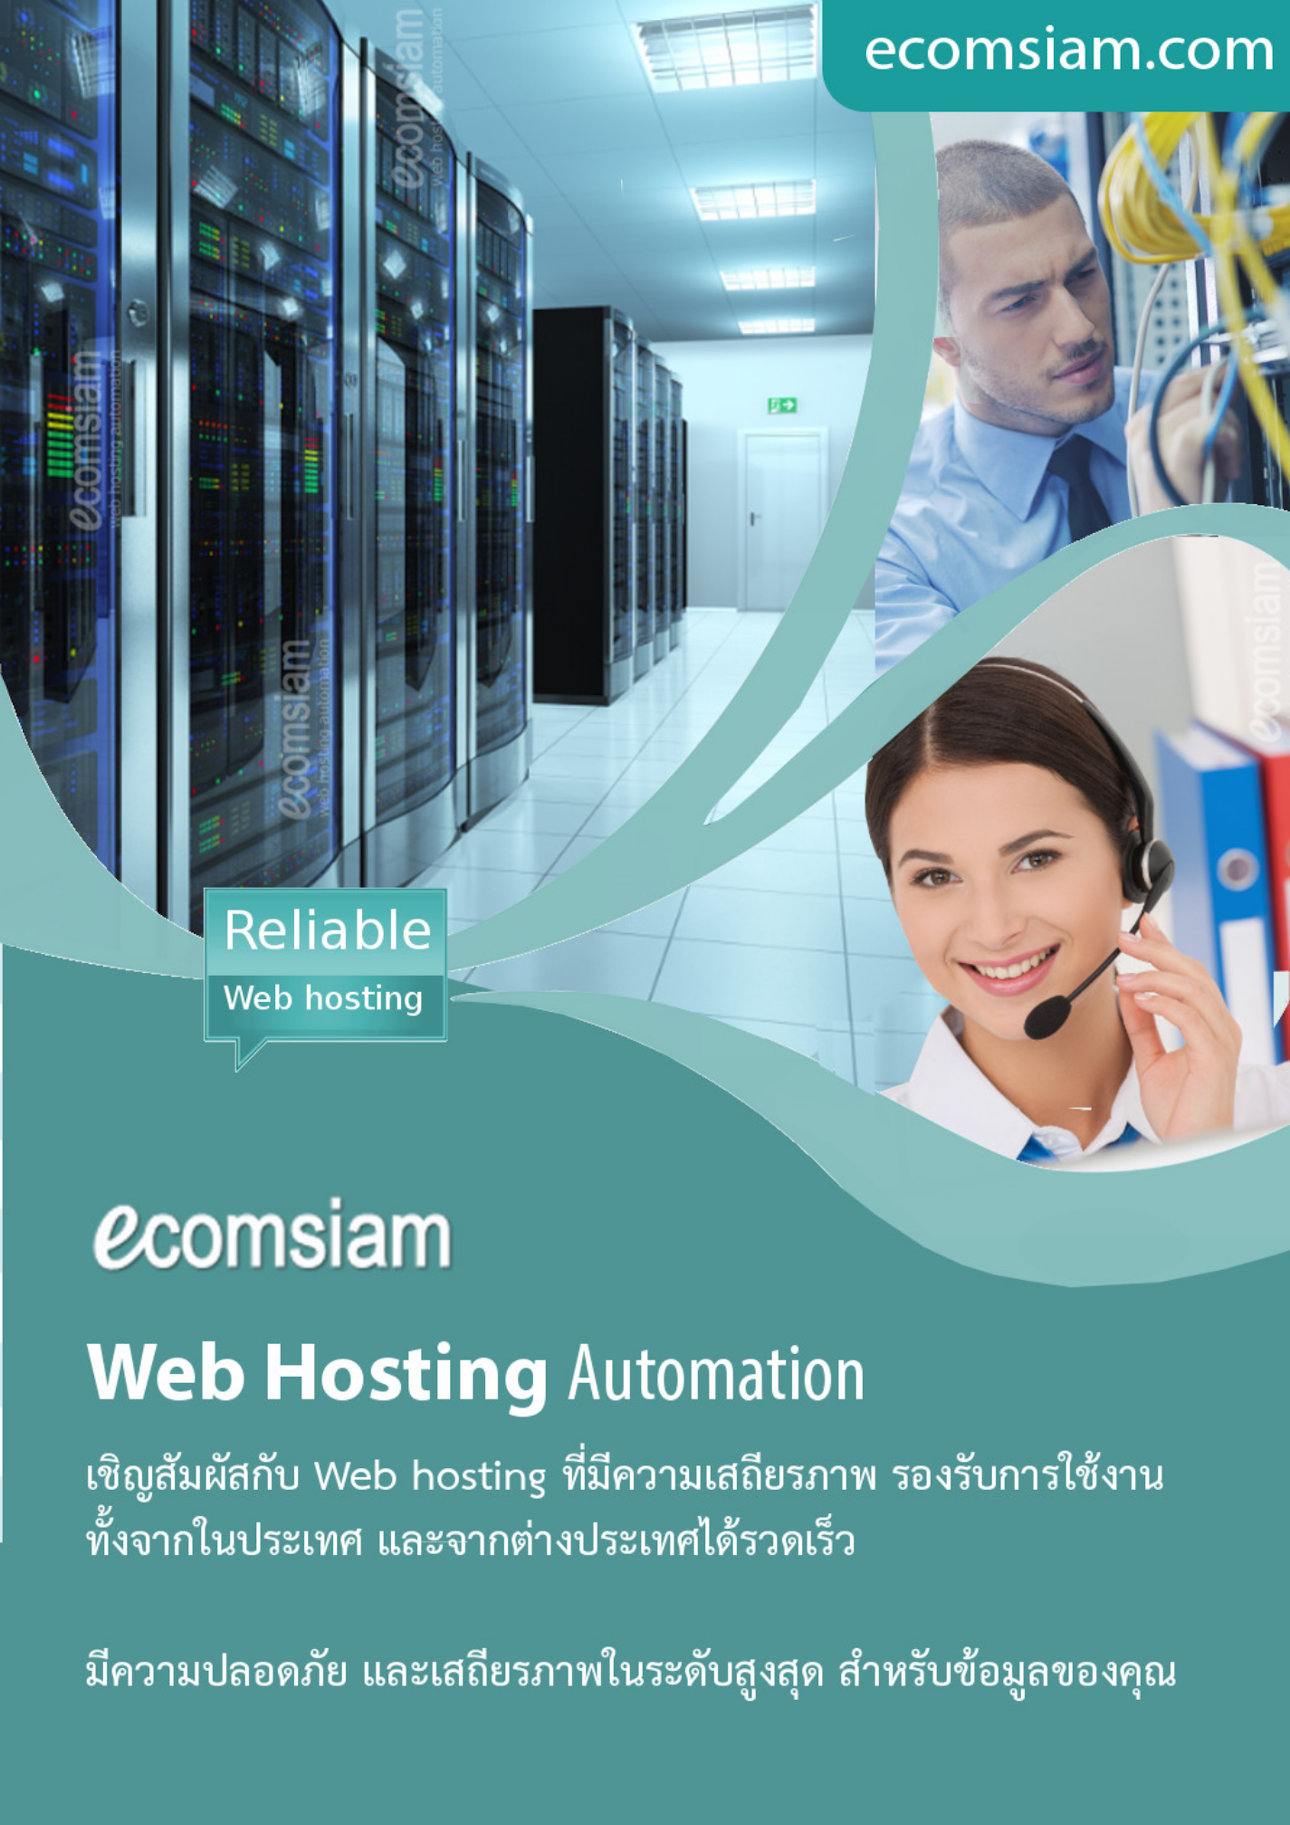 ecomsiam ผู้ให้บริการ web hosting thailand (ประเทศไทย ) บริการเว็บโฮสติ้ง /web hosting ฟรีโดเมน ผู้ให้บริการ web hosting in thailand ใช้ web hosting รายปี ฟรีโดเมน เริ่มต้นเพียง 2,200 บาท/ปี เลือกบริการได้ทั้ง cms web hosting,Blog web hosting,Shopping cart web hosting,Joomla web hosting,Drupal web hosting,OpenCart web hosting,OSCommerce web hosting,Zen Cart Web hosting,Magento Web hosting,PostNuke web hosting,WordPress web hosting,Simple machines web hosting,PHPBB web hosting,MyBB web hosting,Cpanel web hosting นอกจากนี้เว็บโฮสติ้ง(web hosting) ของเรายังมีความพร้อมของระบบ ป้องกัน virus จากอีเมล์ และกรองเมล์ขยะ (spam mail filter) รับจดโดเมน .co.th .ac.th 800 บ./ปี จดโดเมน .com 490 บ./ปี และบริการเว็บสำเร็จรูป ฟรีโดเมน ที่ใช้งานง่าย ถูกใจ